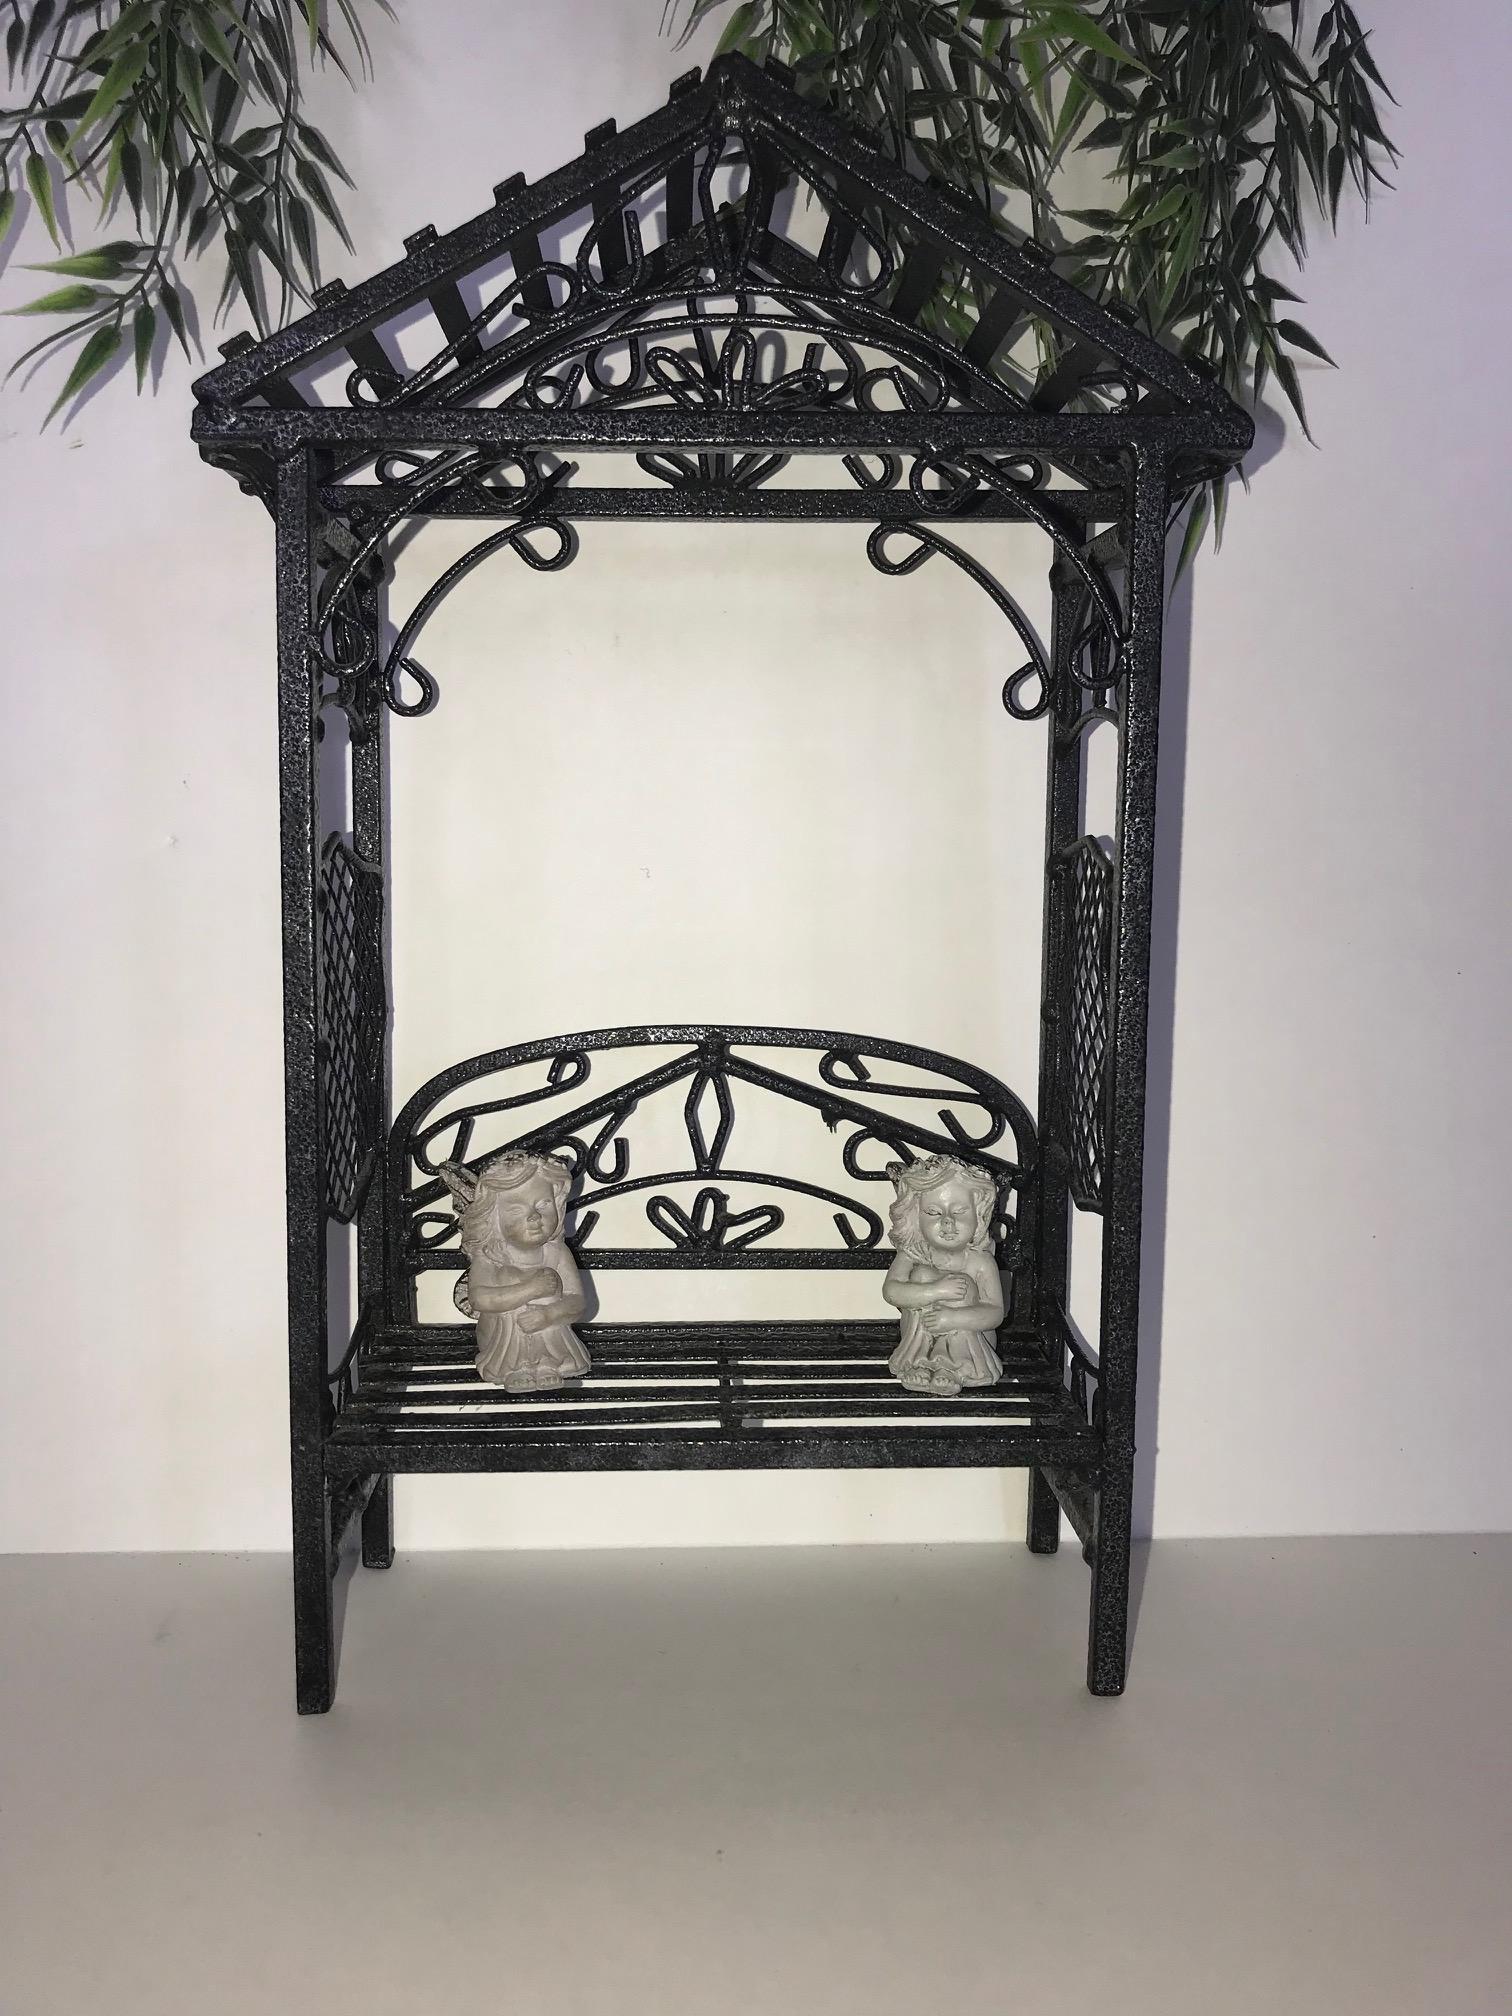 Miniature Fairy Arbor Bench with 2 Fairies - Quality Metal Garden Furniture, Amazing Decorative Detail